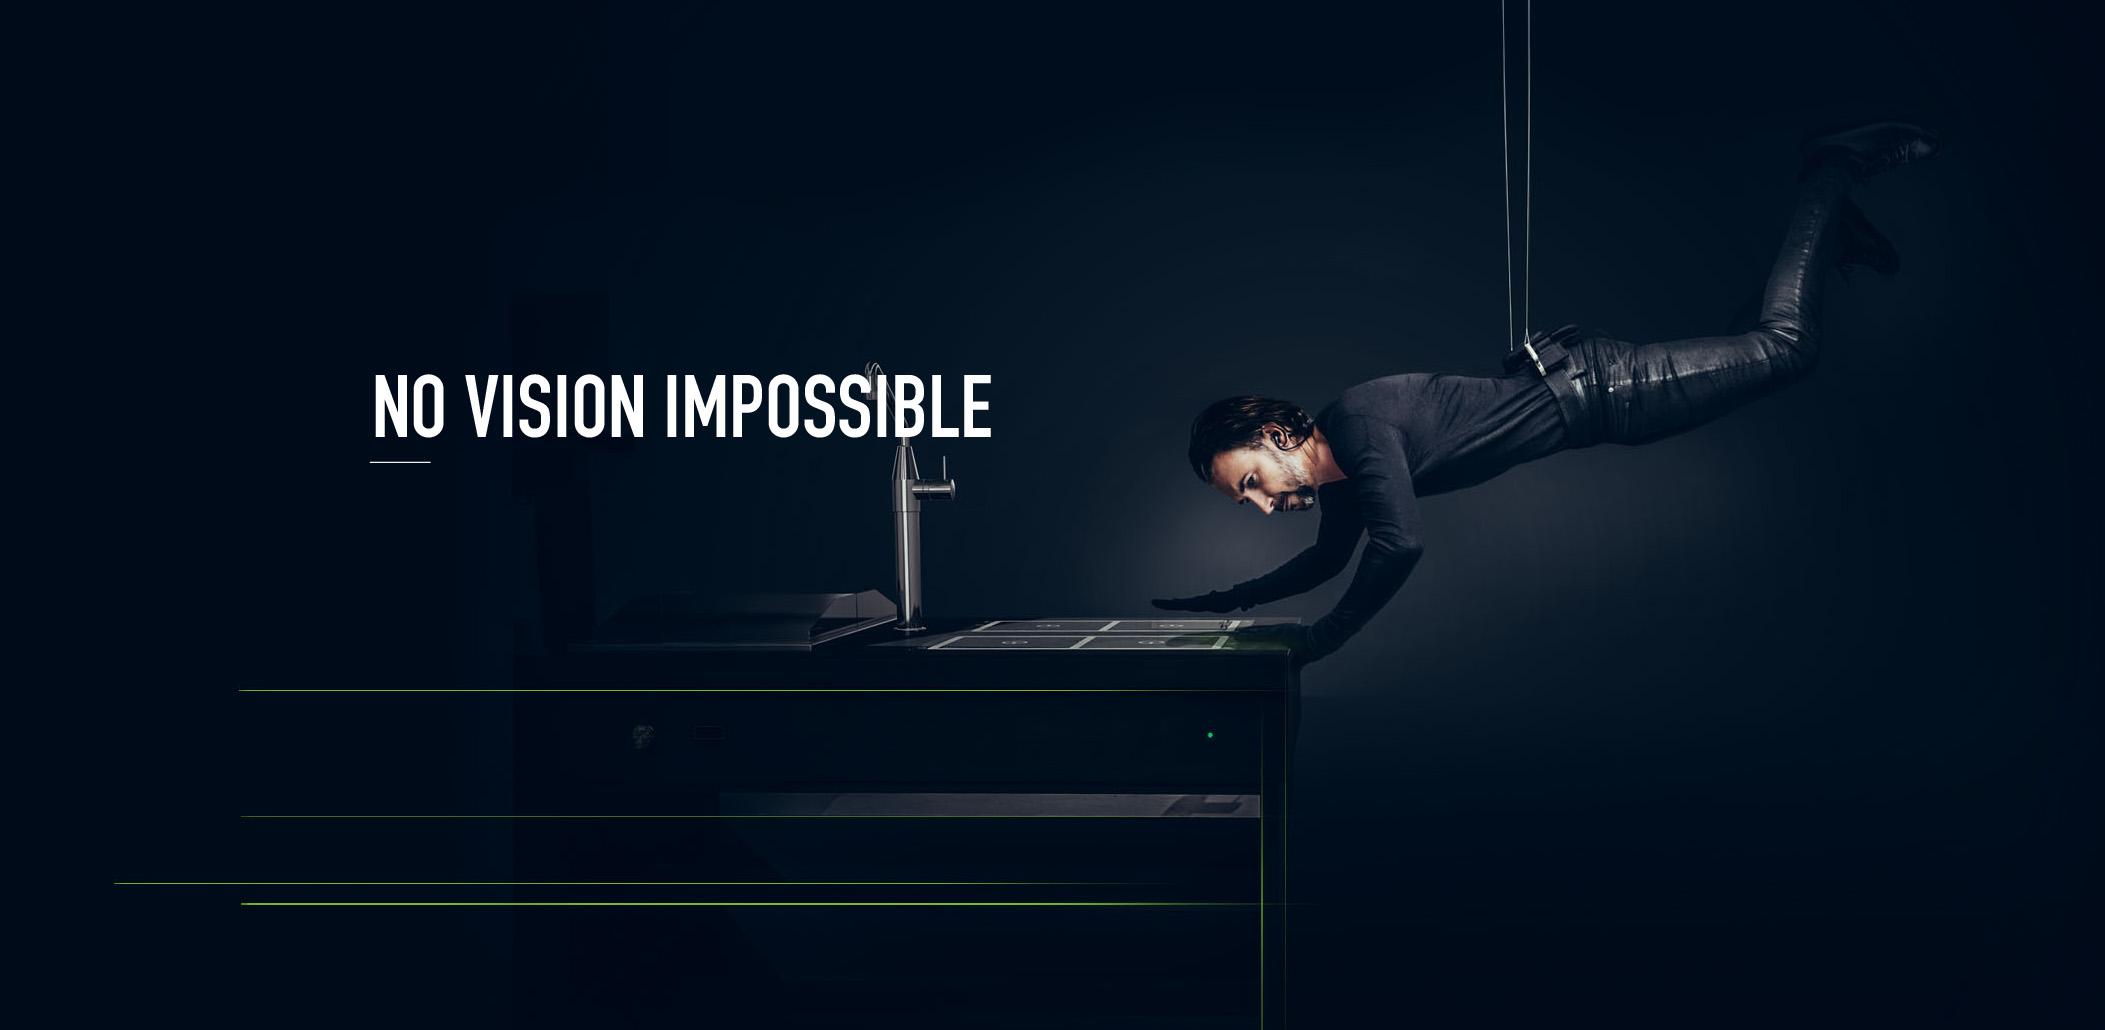 No Vision Impossible